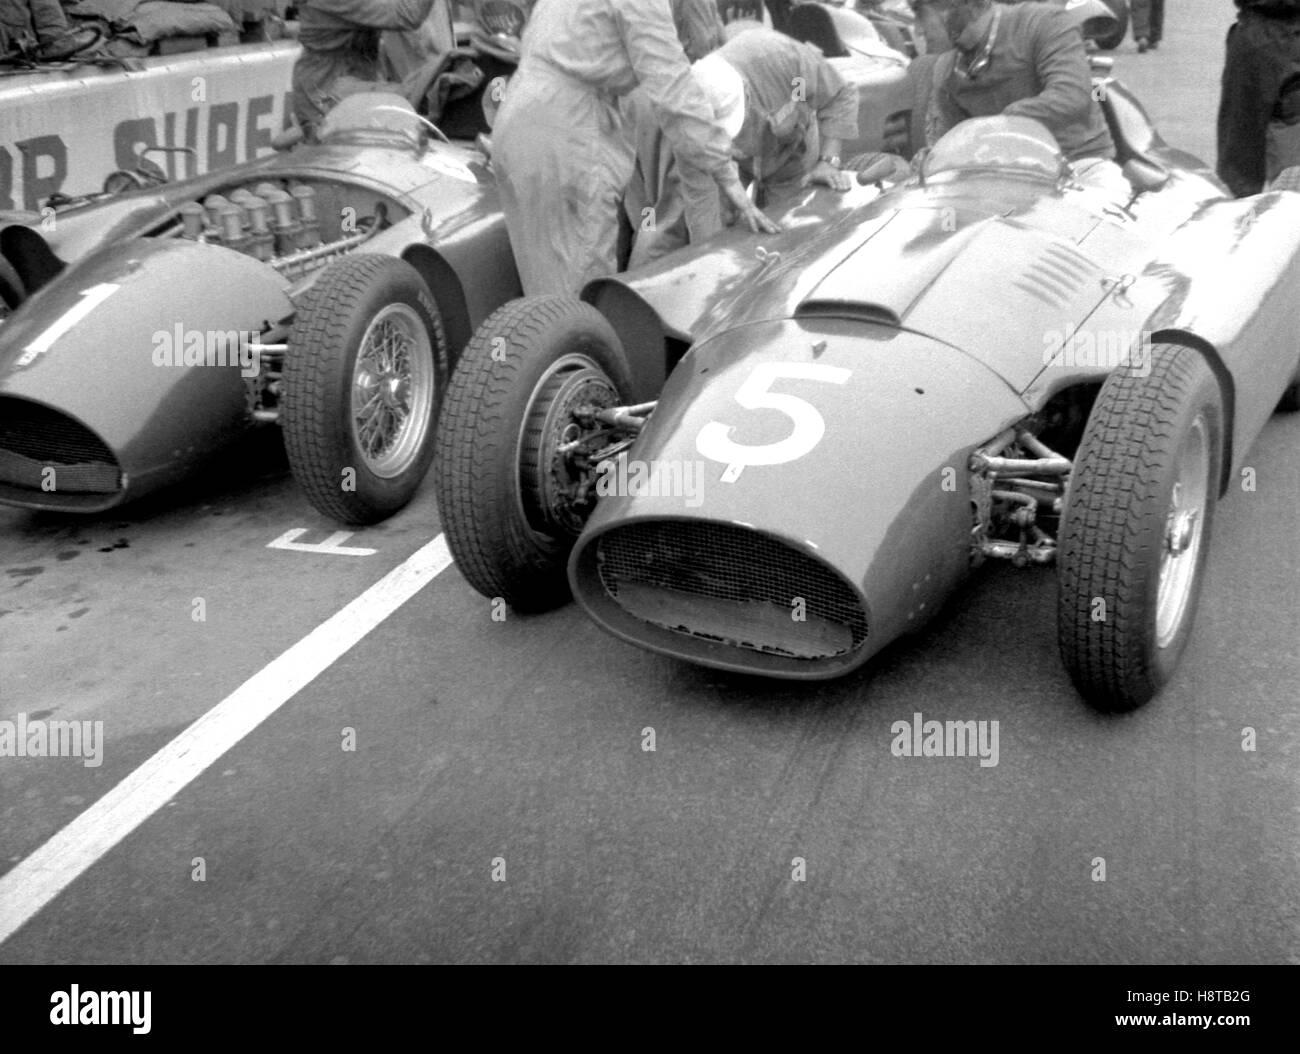 1956 ITALIAN GP LANCIA FERRARIS PITS - Stock Image